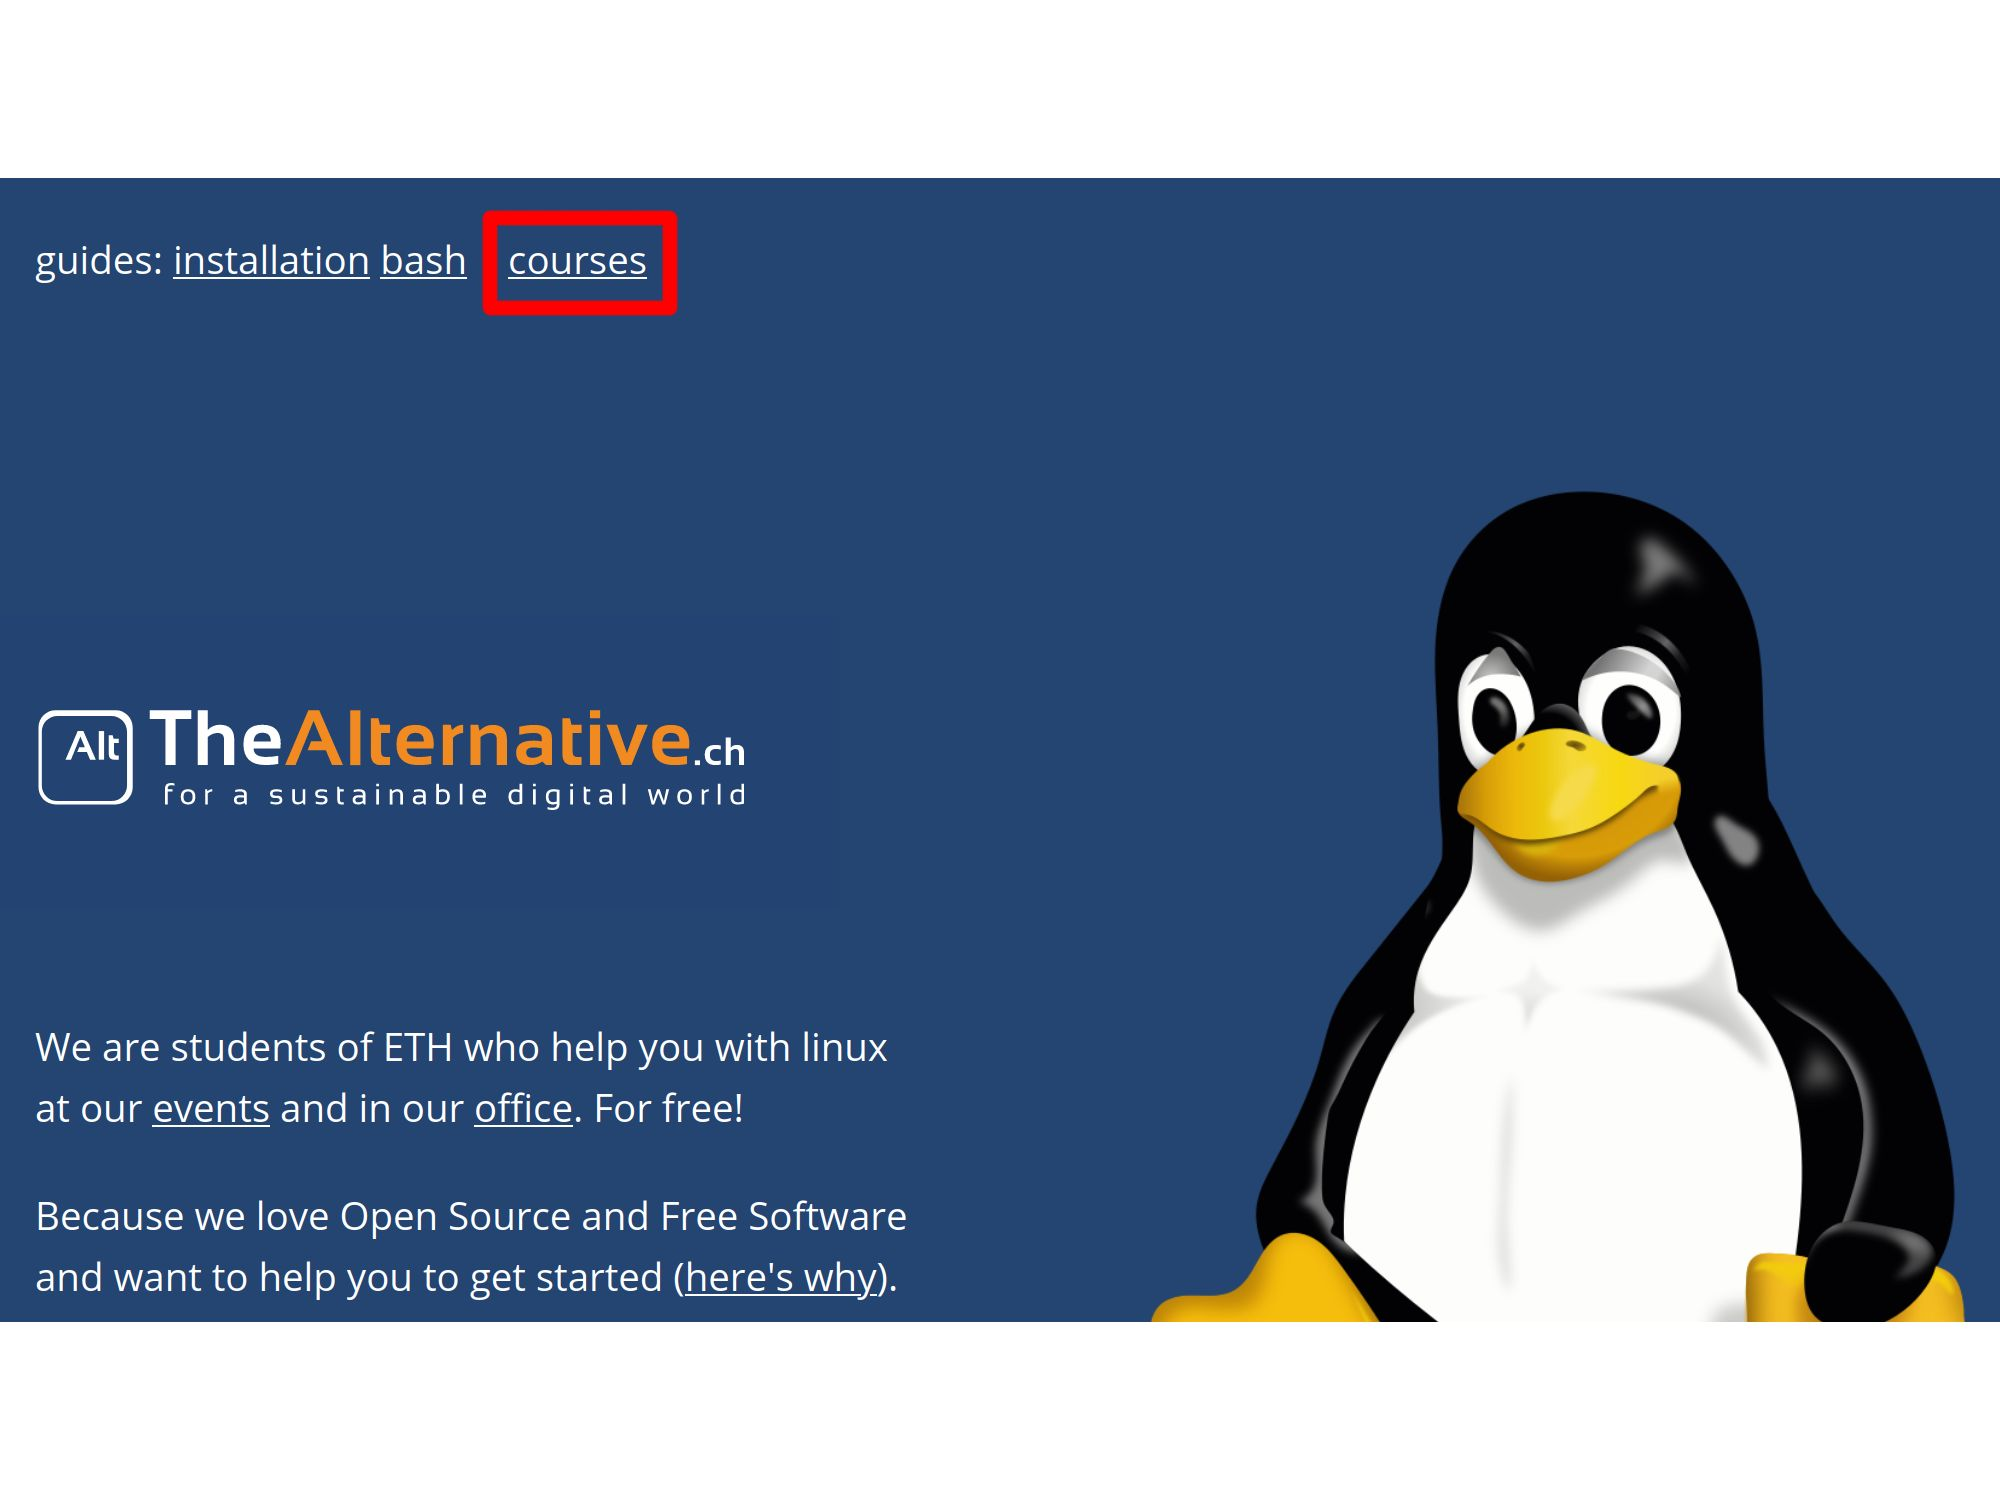 linux_toolkit_2021/images/slides.jpg